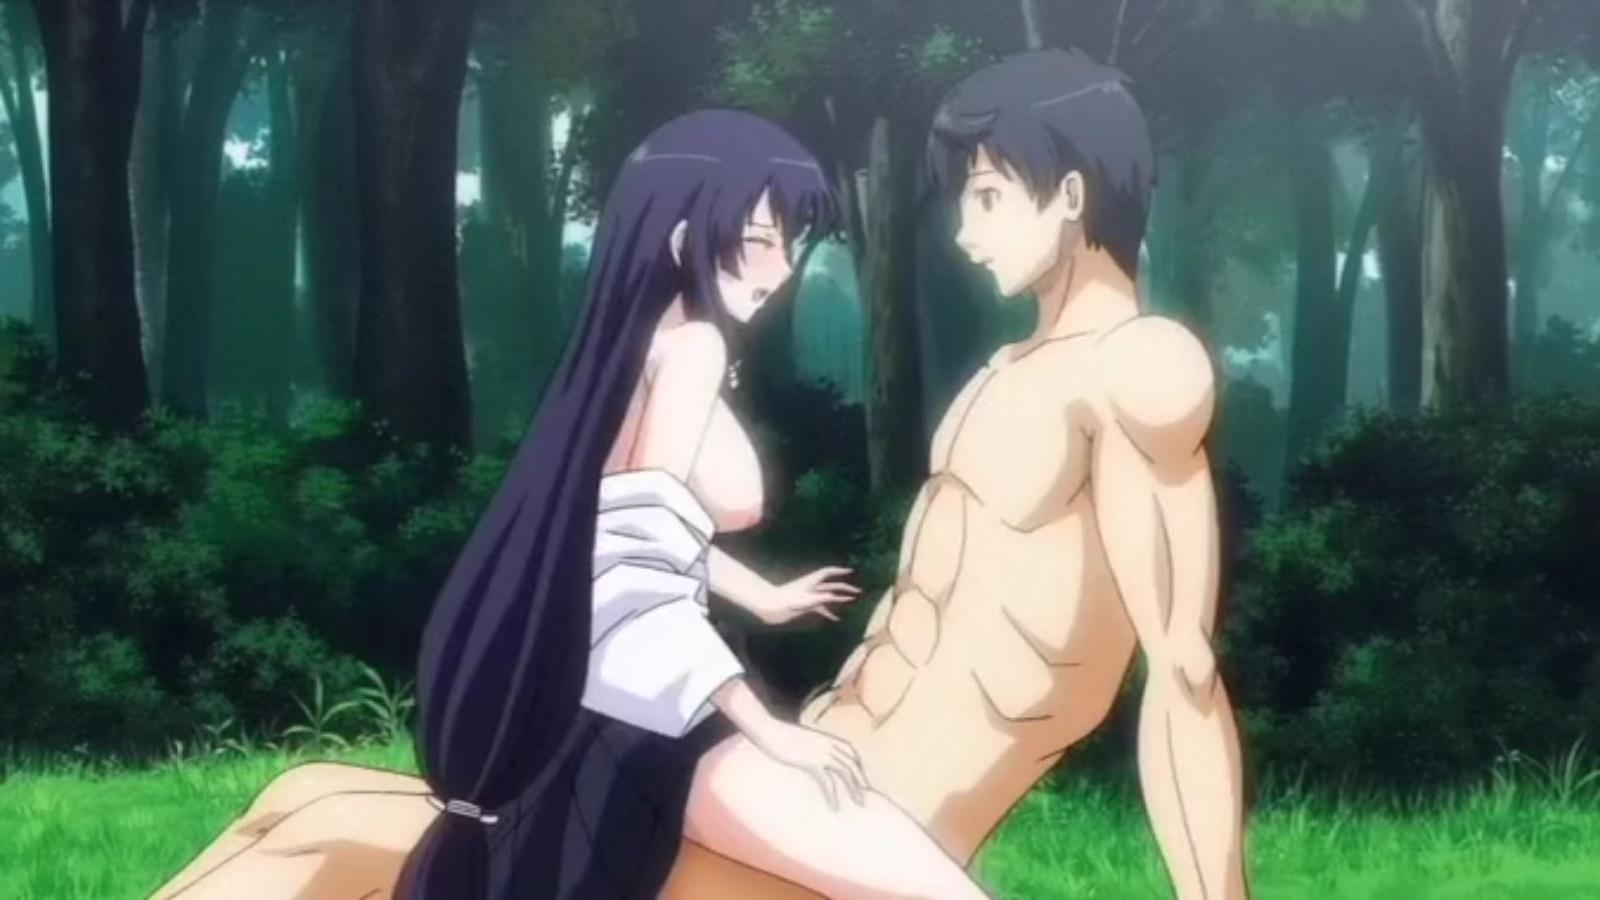 Sexy midget porn story